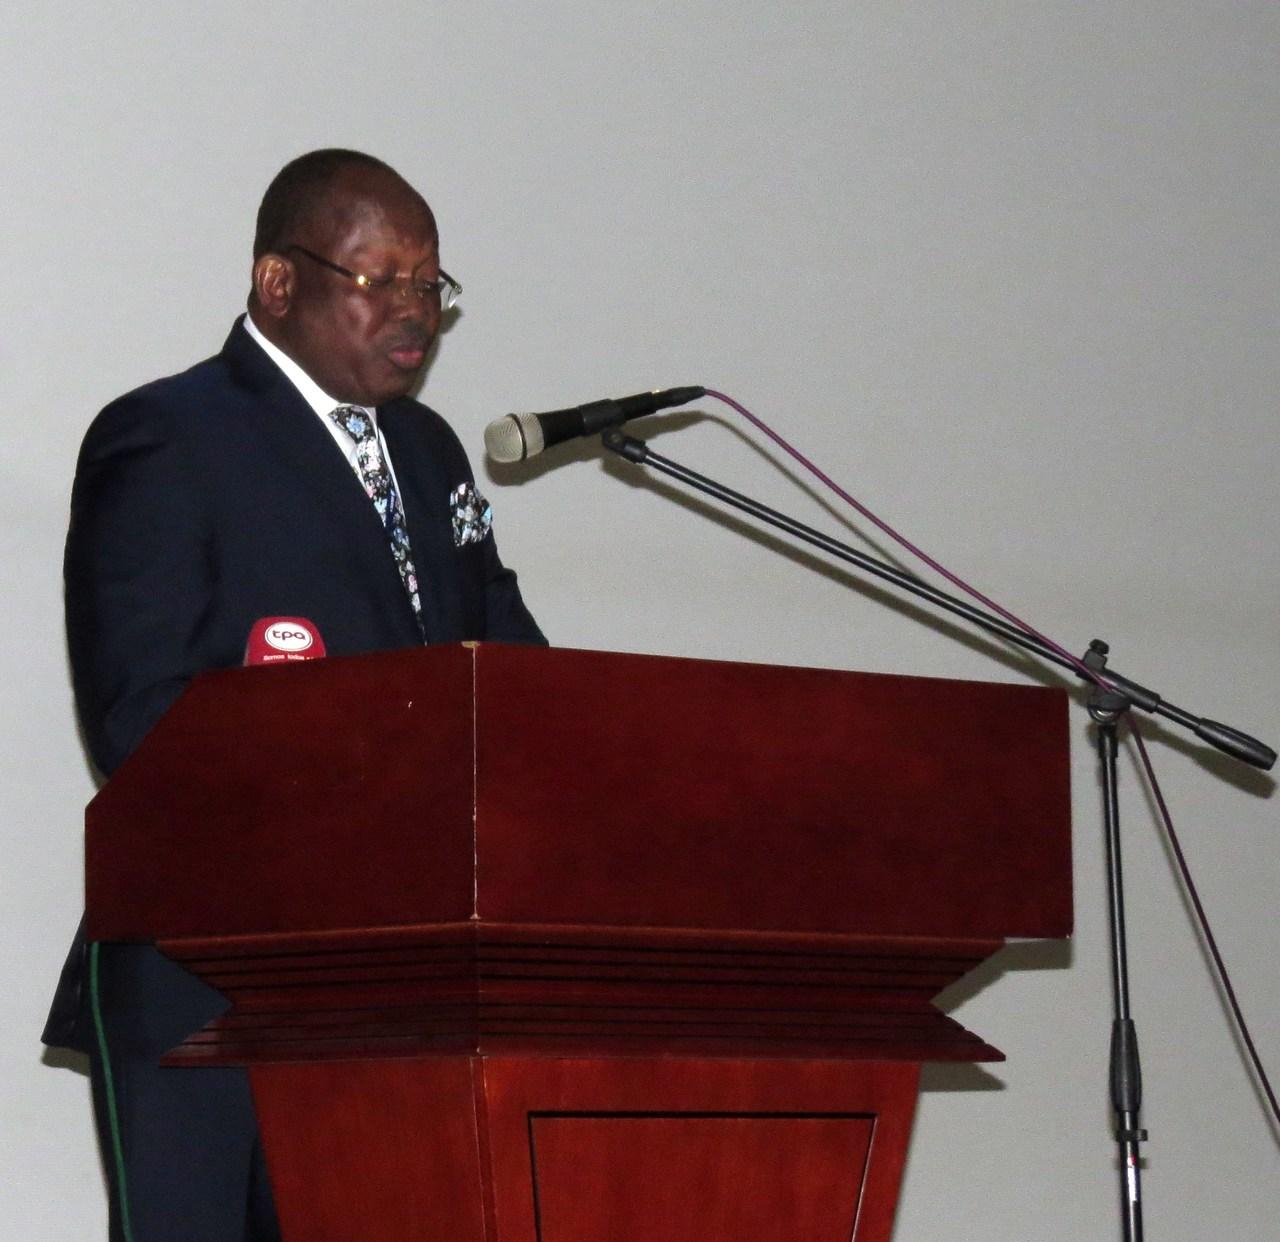 Discurso do Dr. Guilherme Luís Mavila, durante a XII Conferência Anual da RELOP